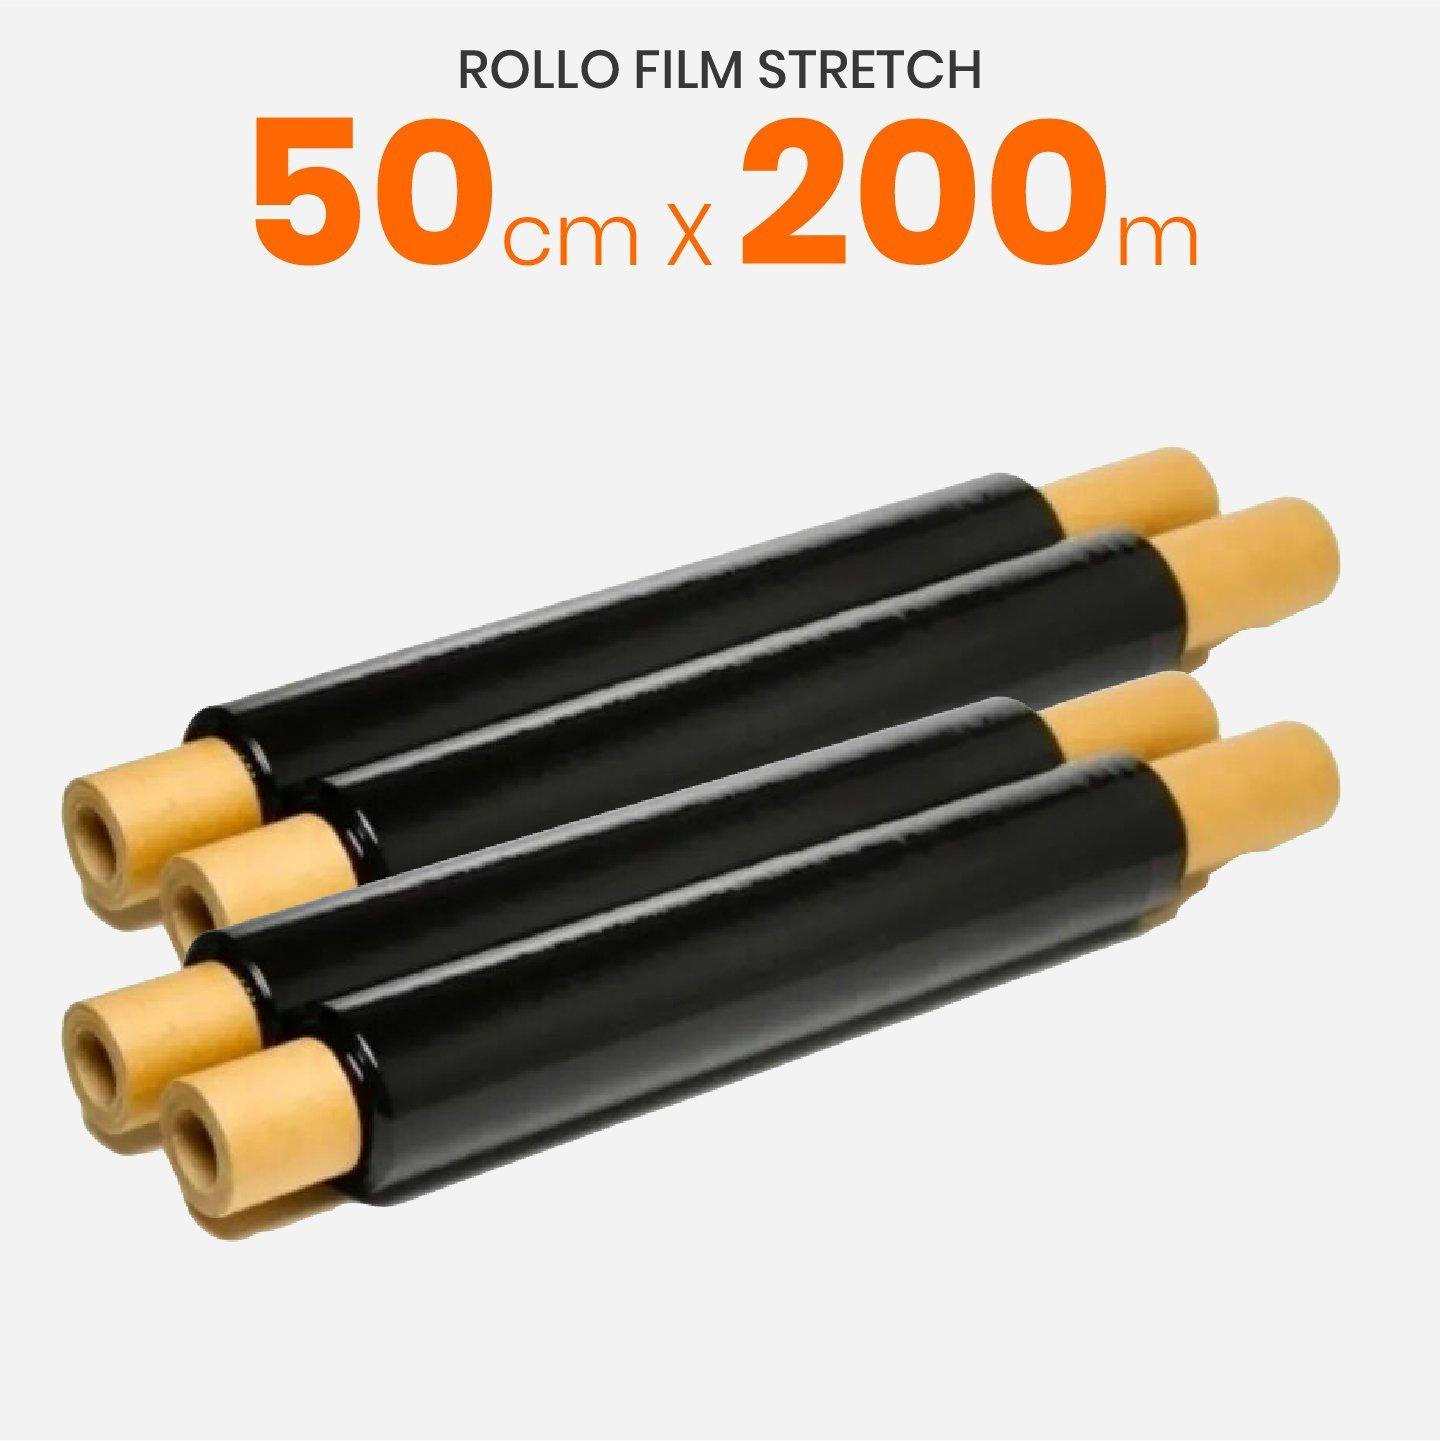 Rollo Film Stretch Virgen Negro Reforzado Con Mango 50cm x 200mts